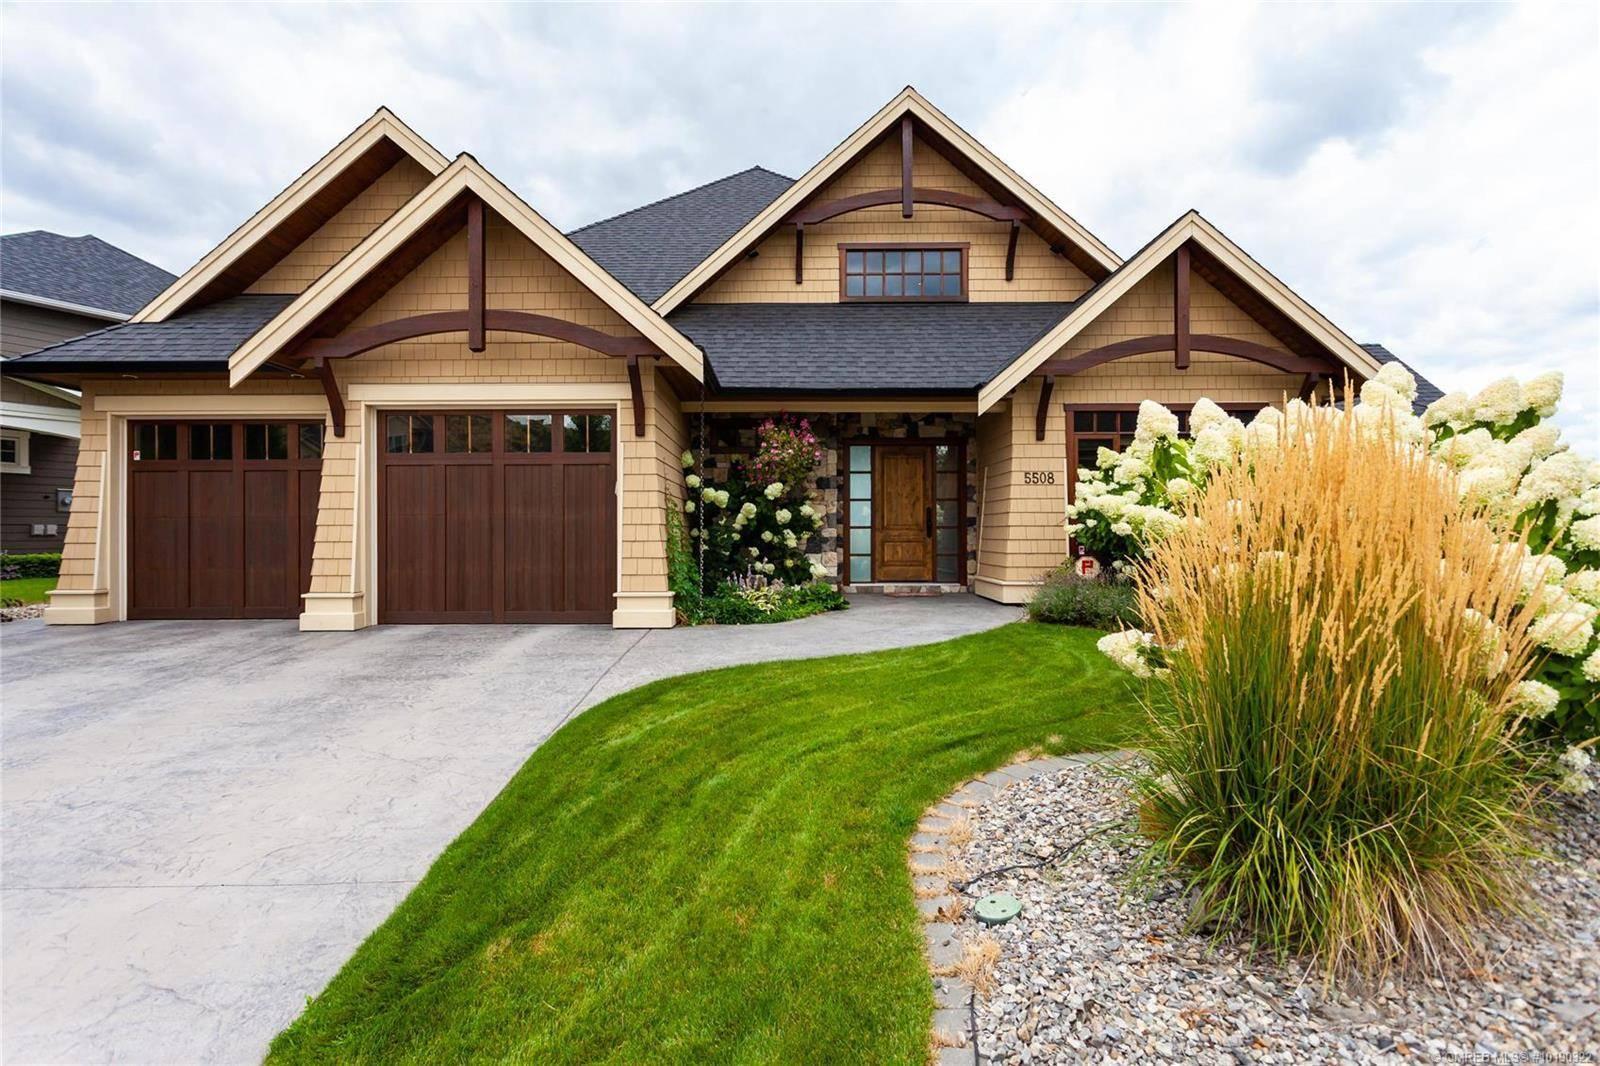 House for sale at 5508 Trestle Ct Kelowna British Columbia - MLS: 10190322